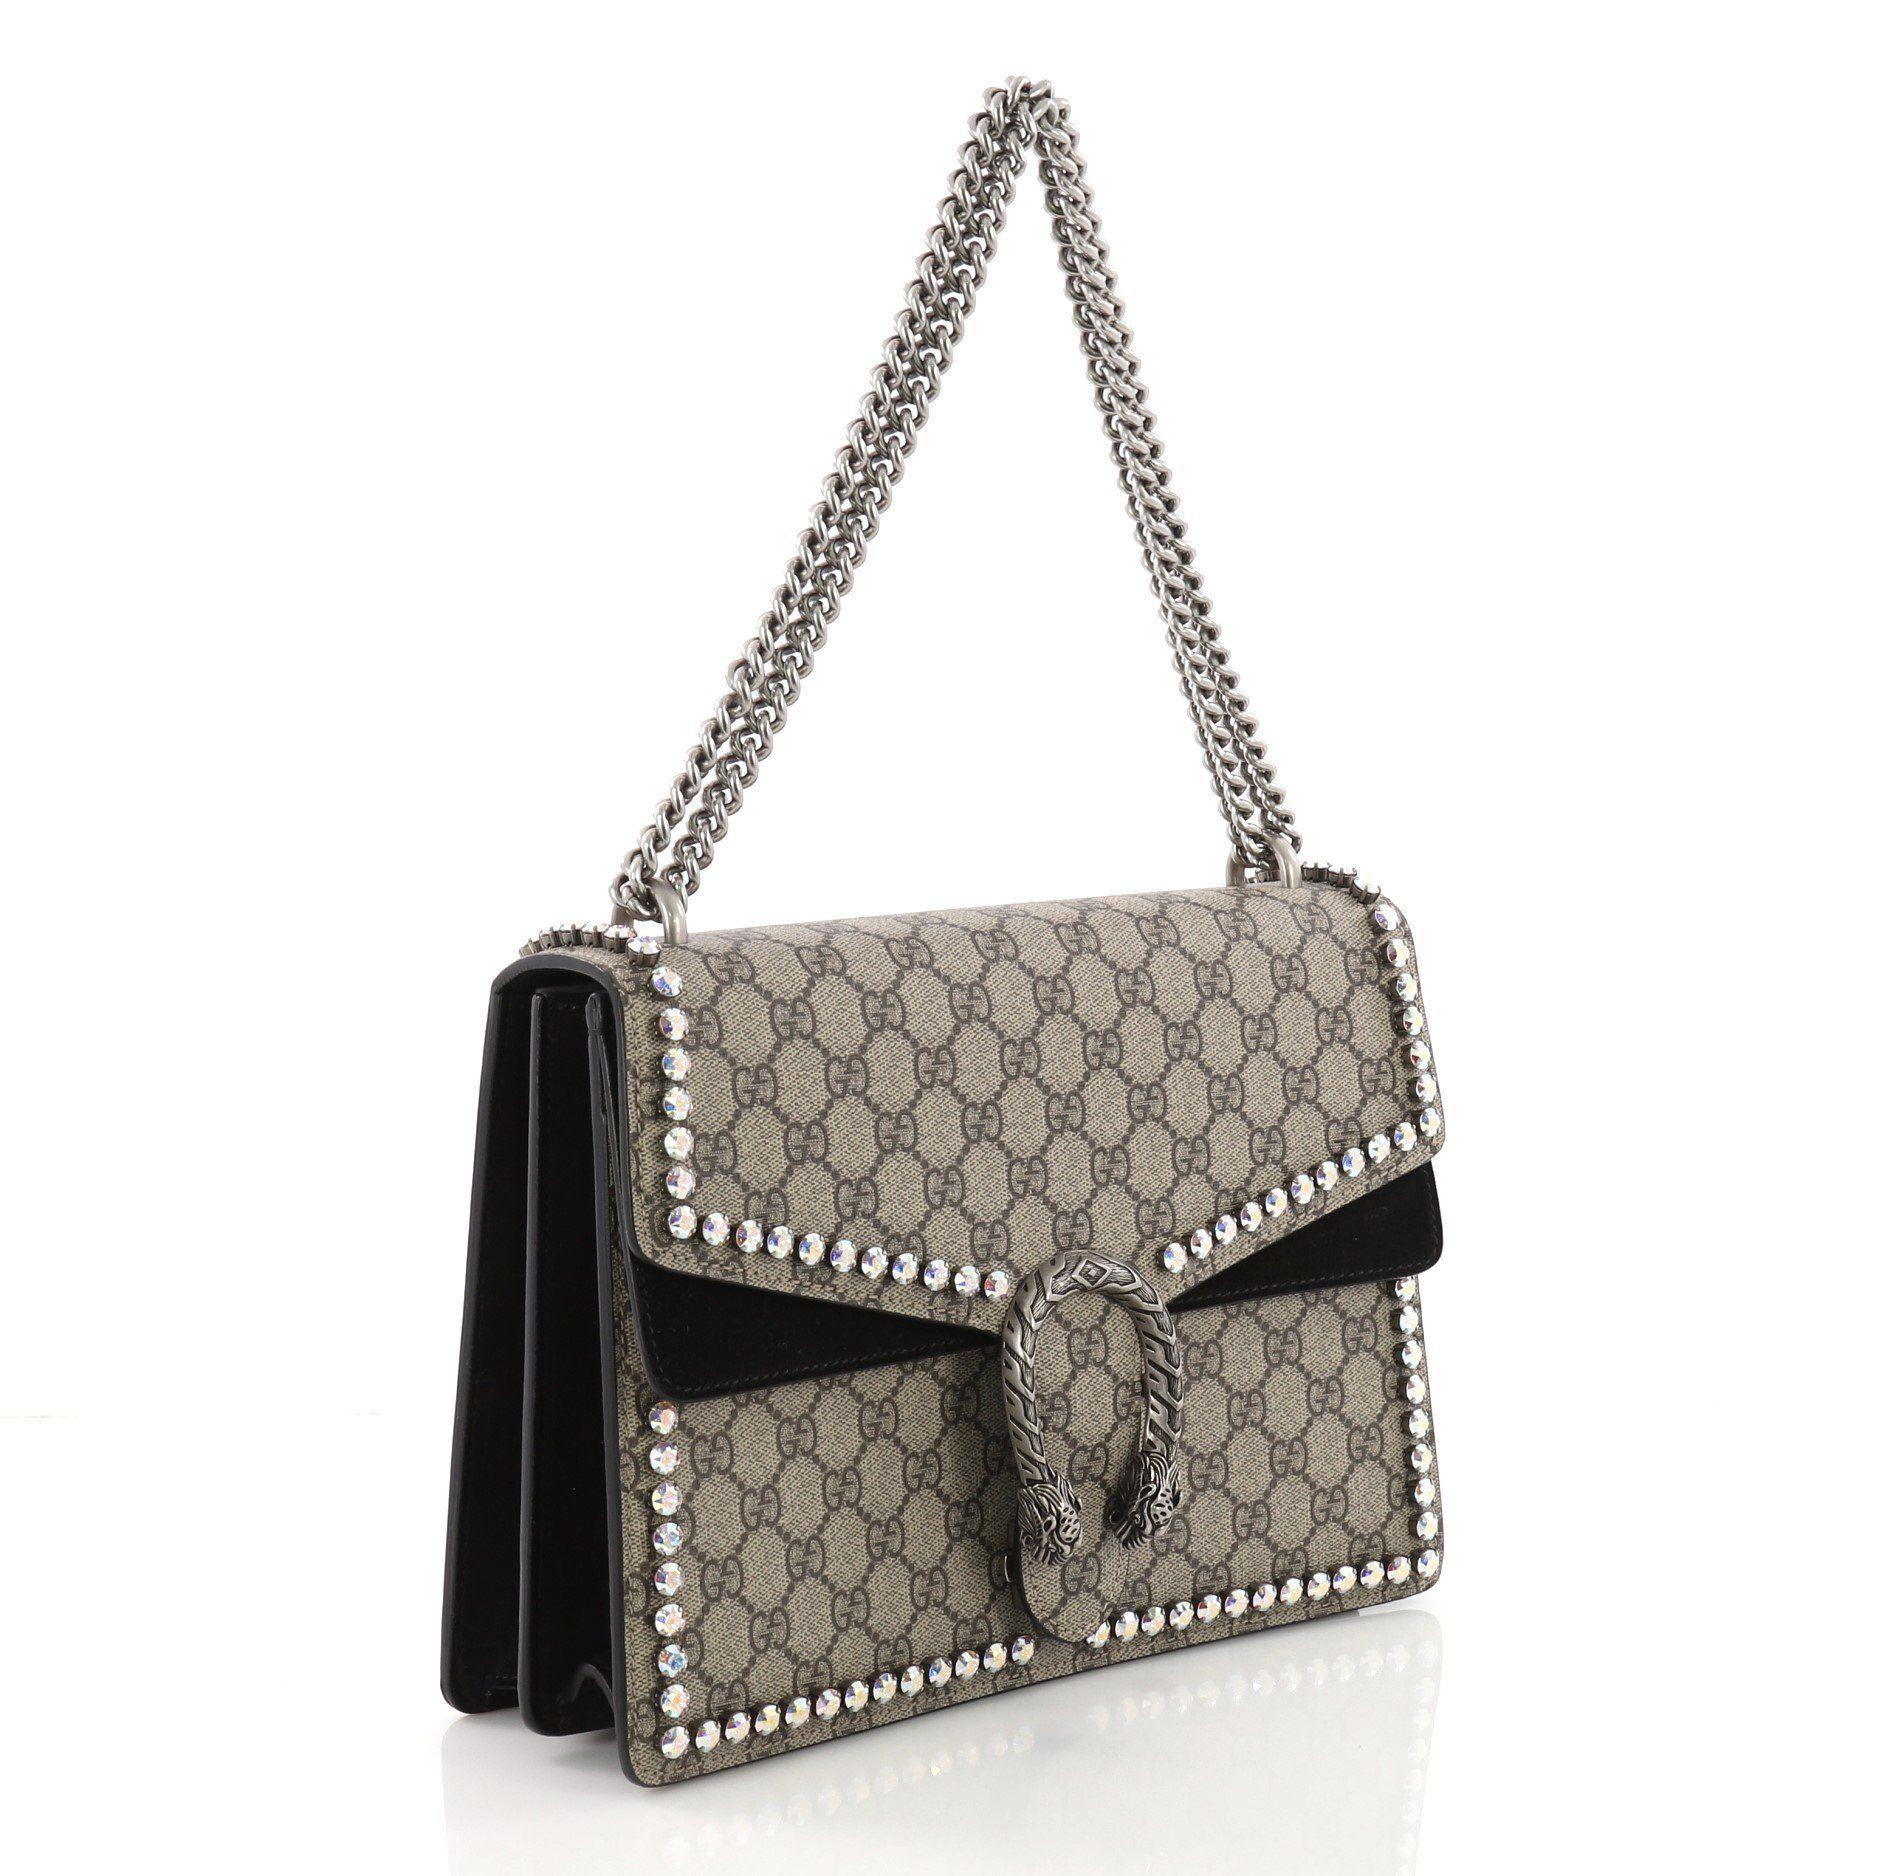 03bdc8b5f53 Gucci - Multicolor Pre Owned Dionysus Handbag Crystal Embellished GG Coated  Canvas Medium - Lyst. View fullscreen